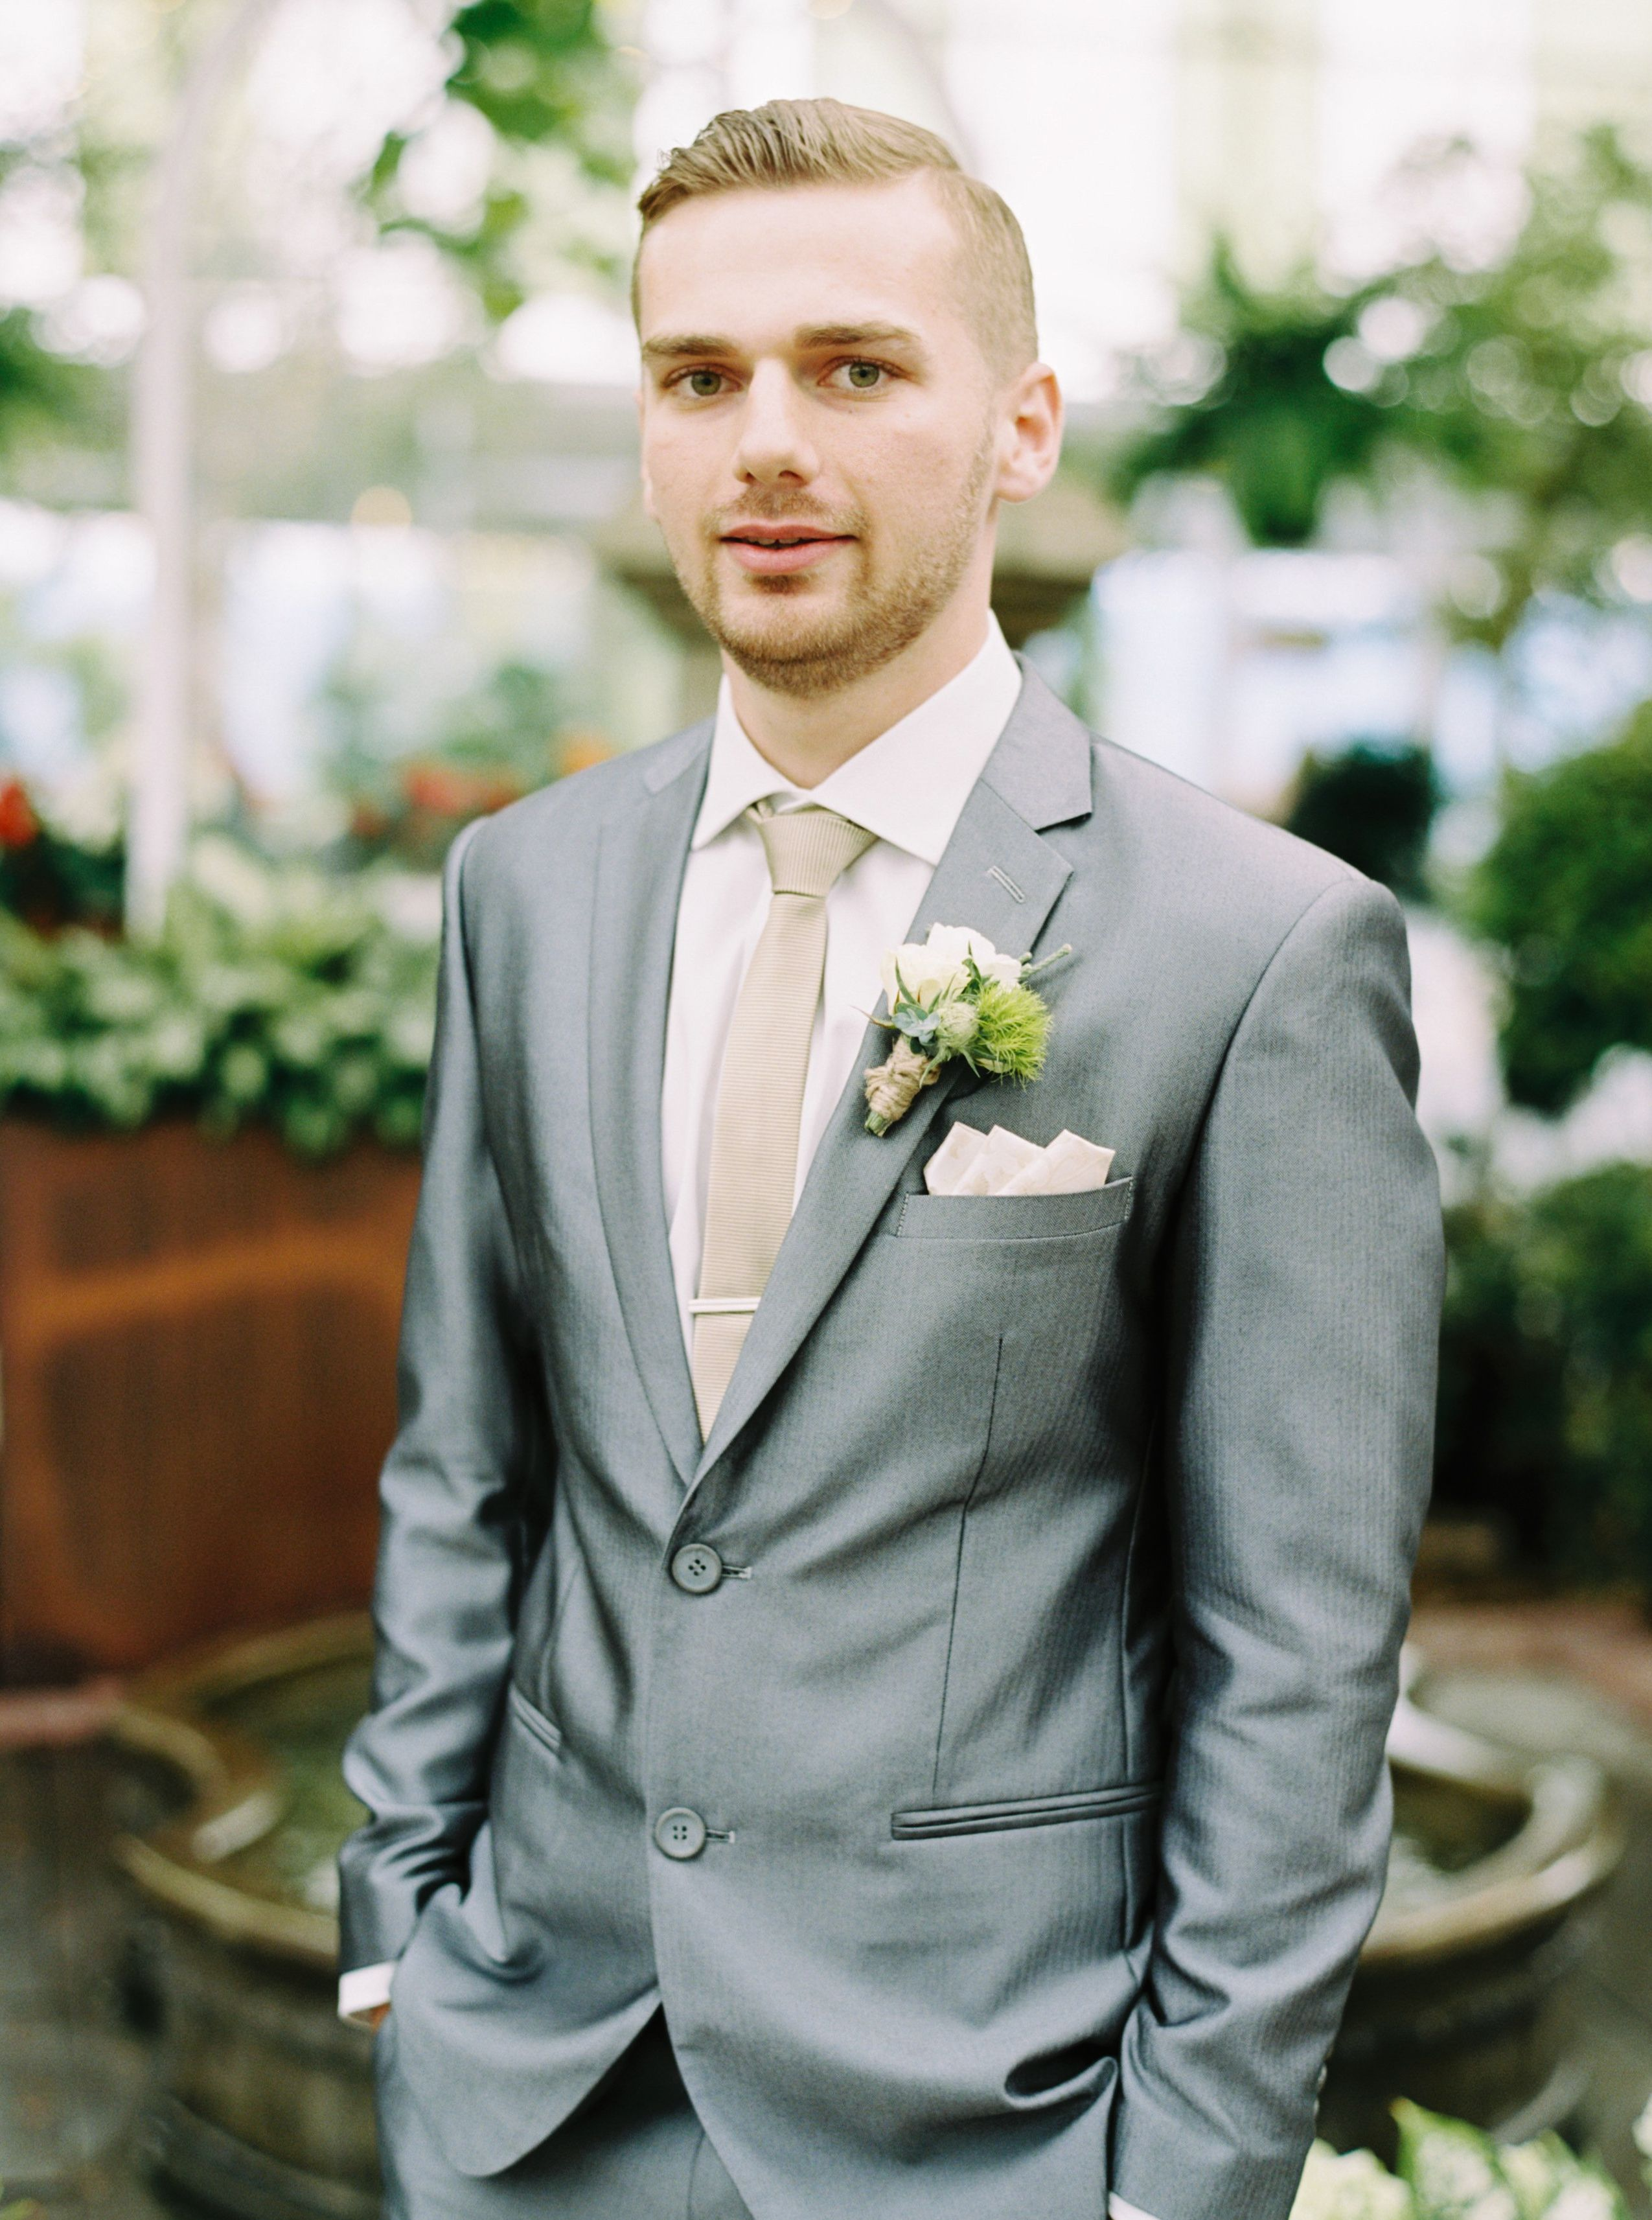 Jos A Bank 602 Ivory Troy Tuxedo Wedding Tux Wedding Suits Tuxedo Wedding